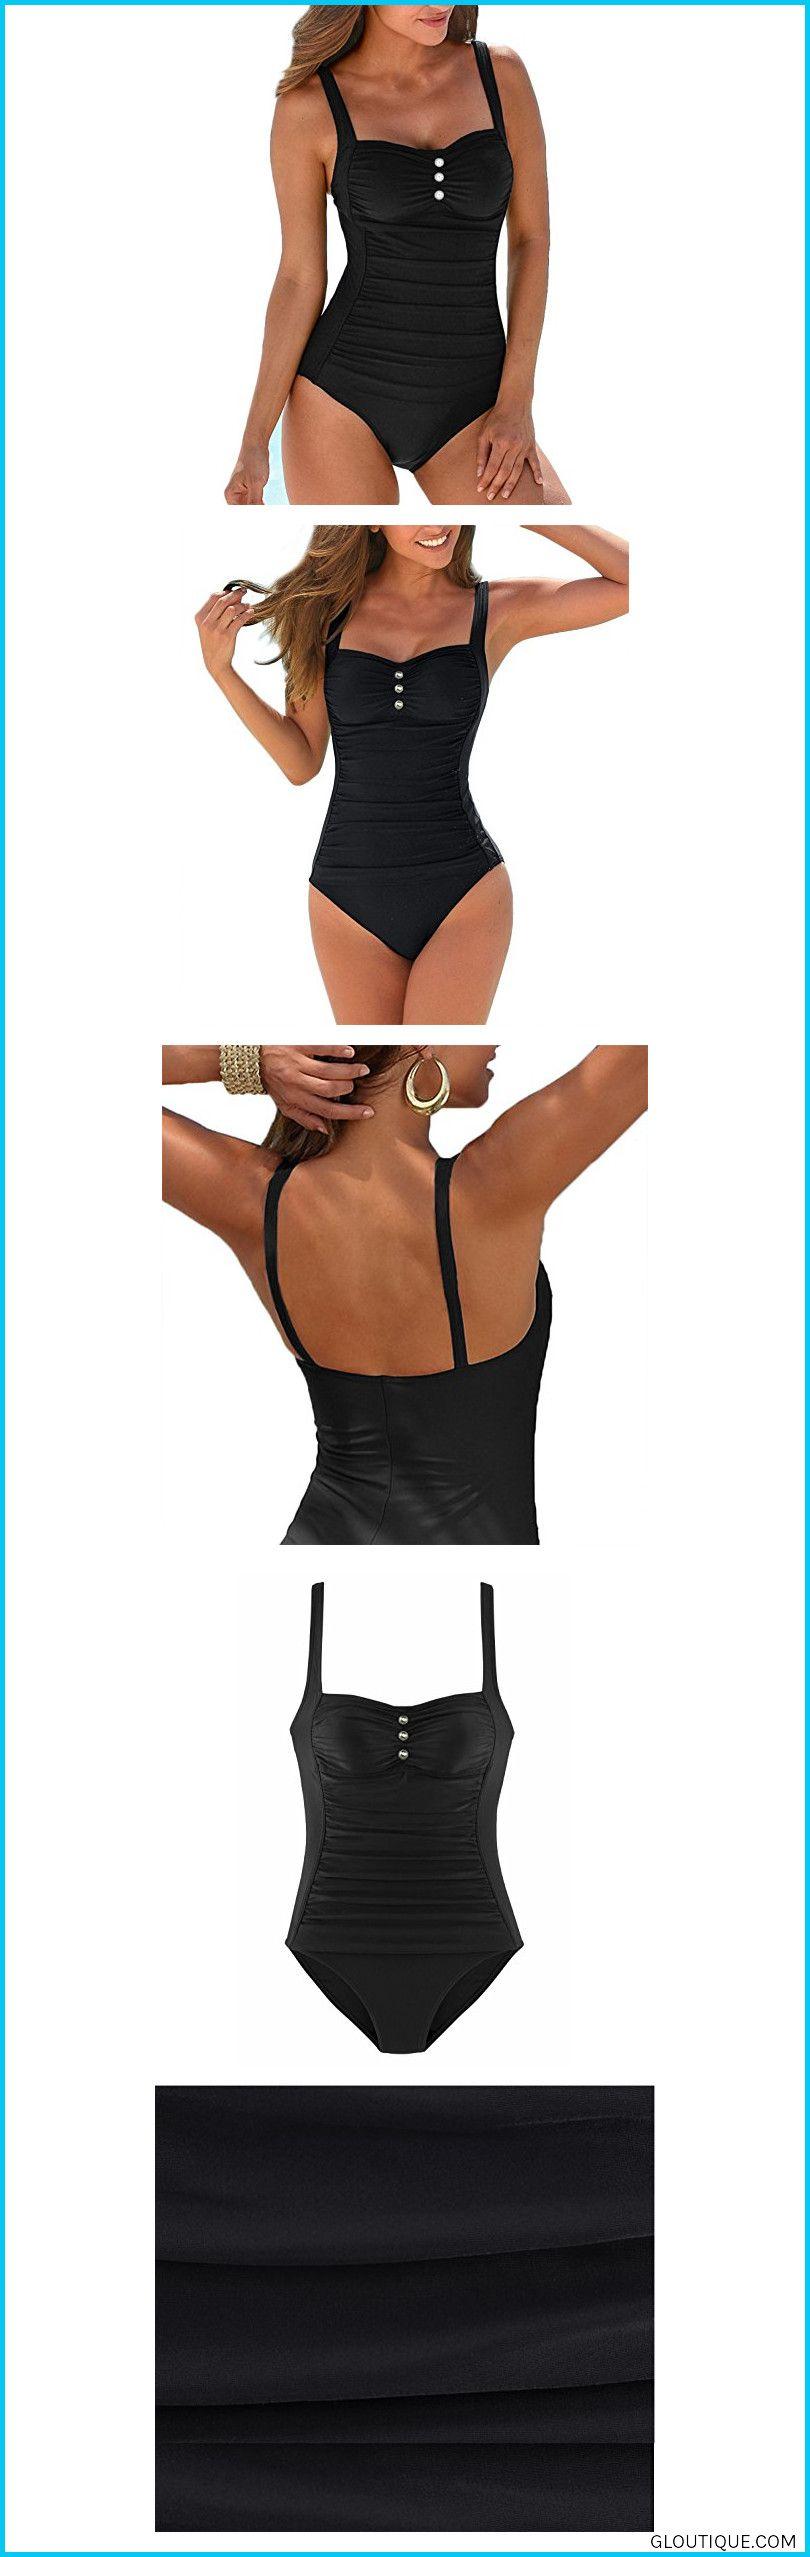 a716a66b3b ... Push Up, Ruched, Retro Bathin#fashionUpopby Women's Retro Tummy Control  One Piece Swimsuits Monokini Push up Bathing Suits Swimwear Black 10 #Upopby  ...